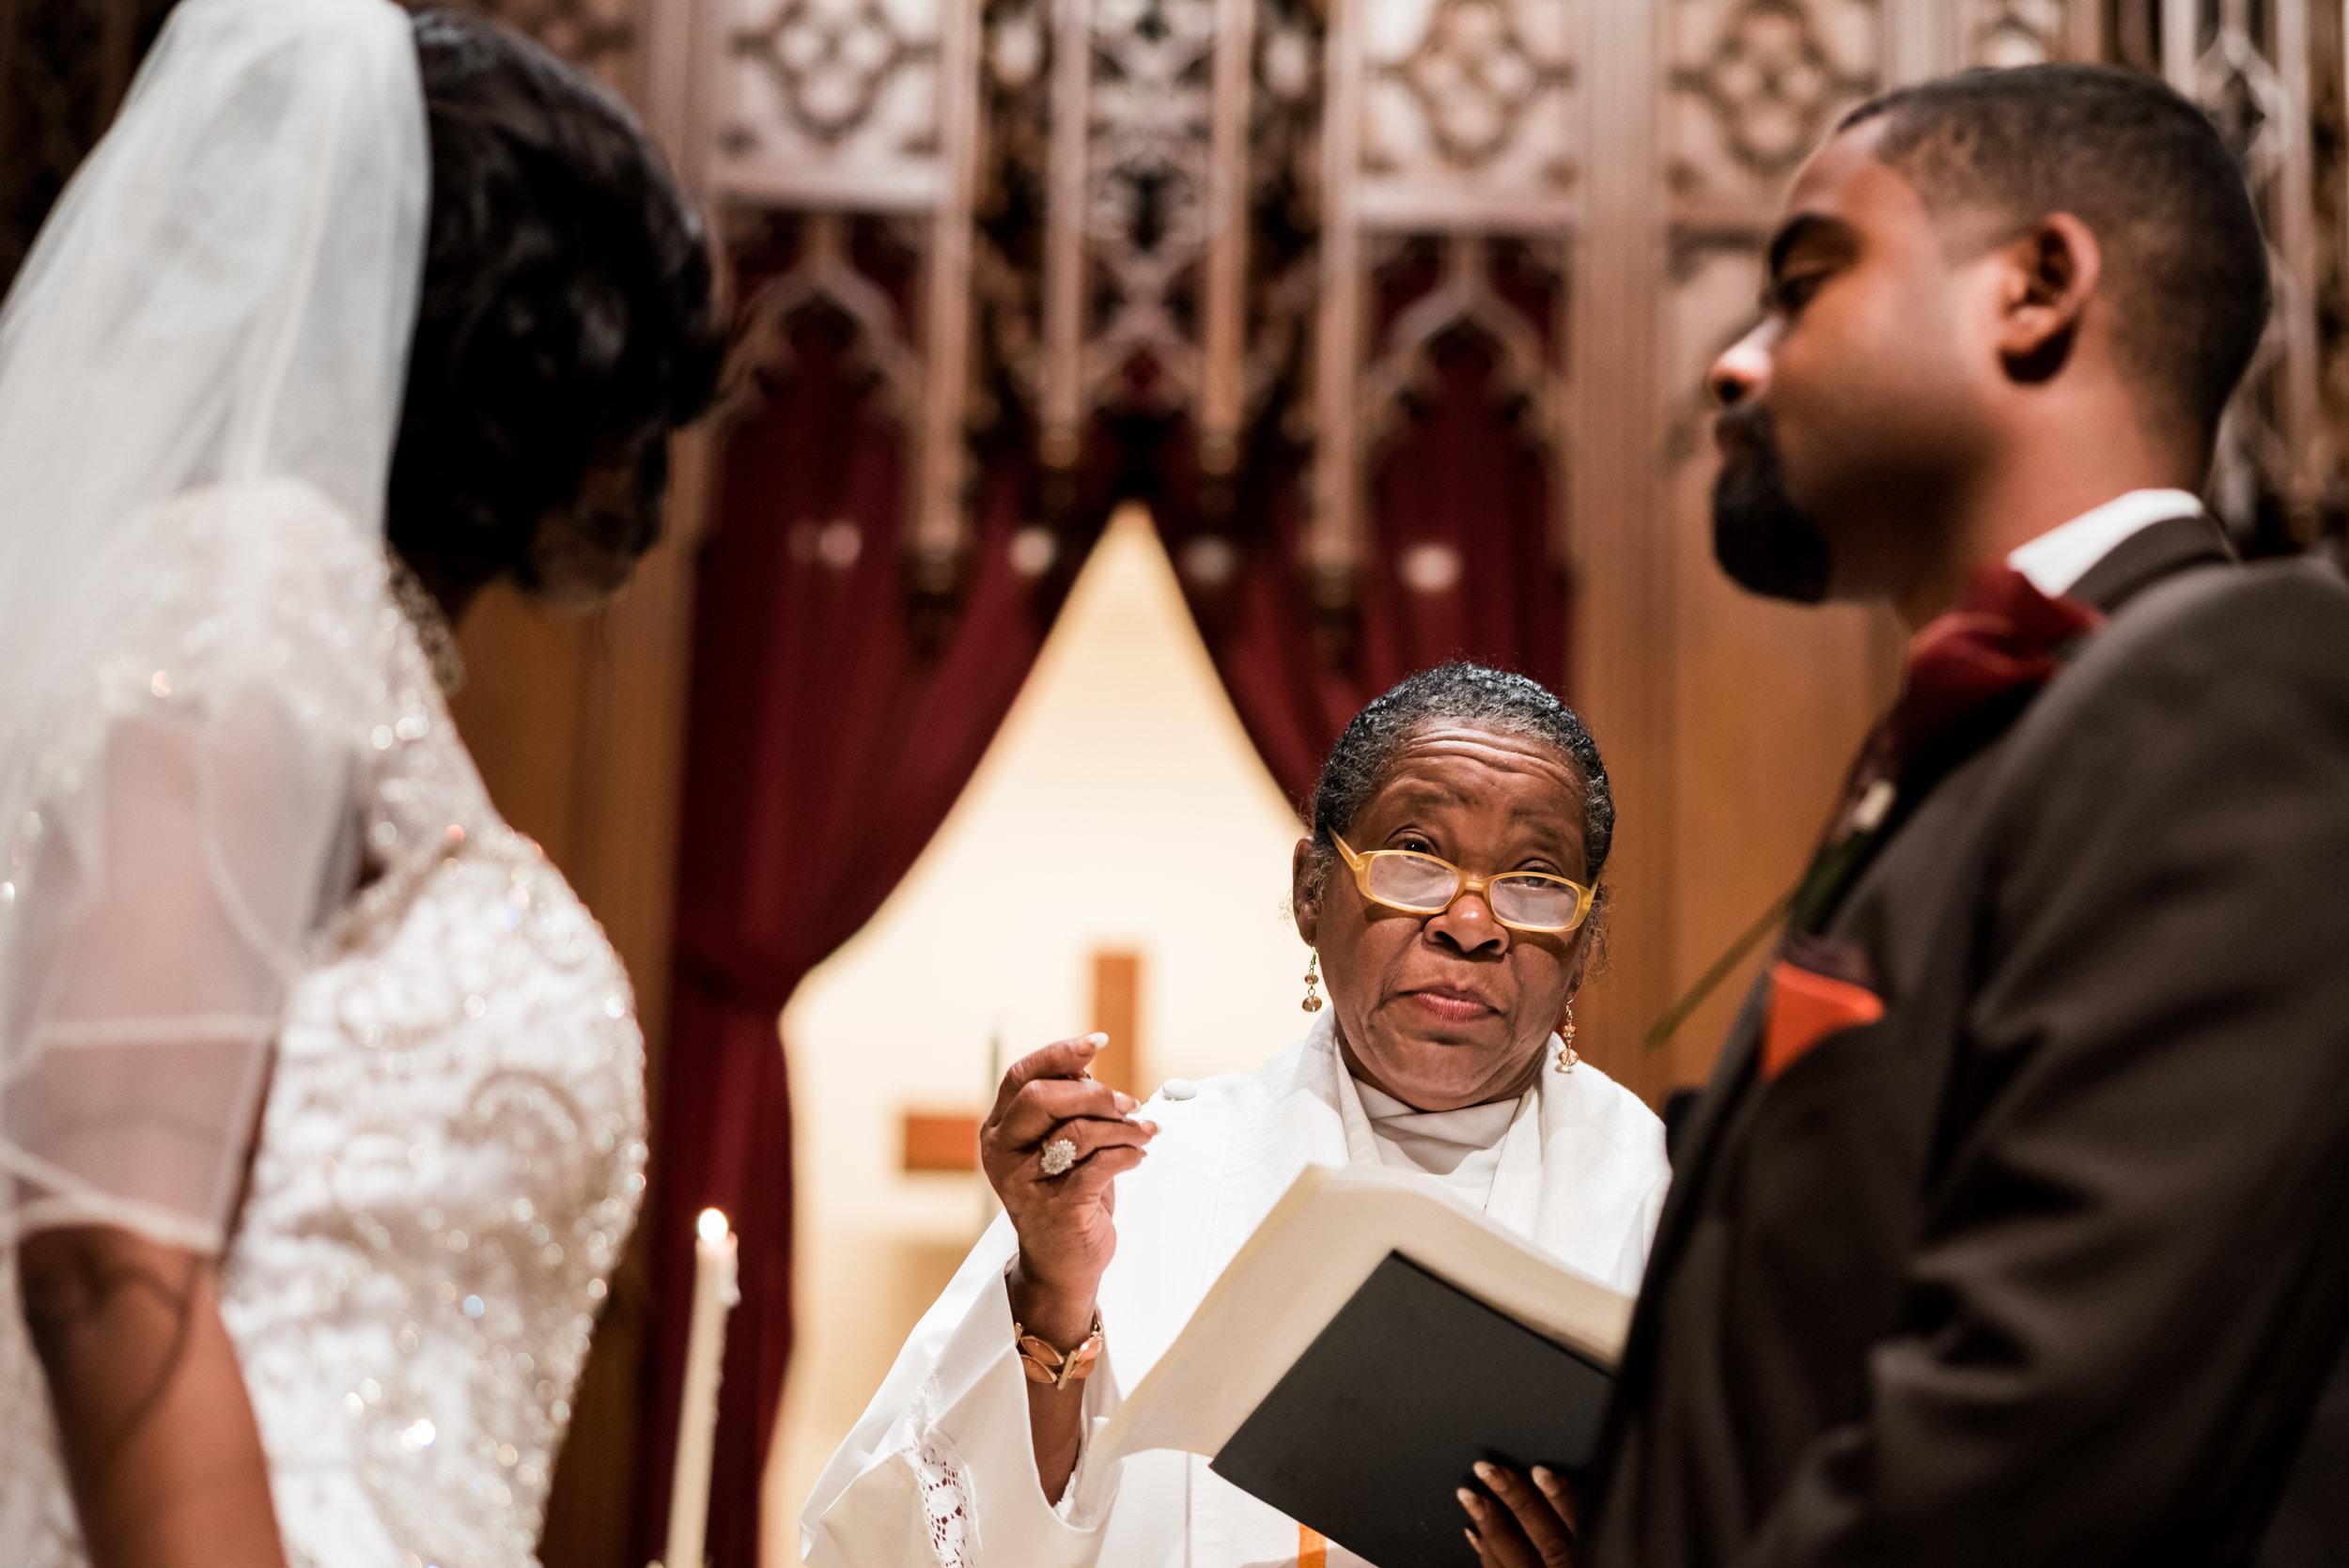 st-louis-wedding-photographer-third-baptist-church-404.jpg